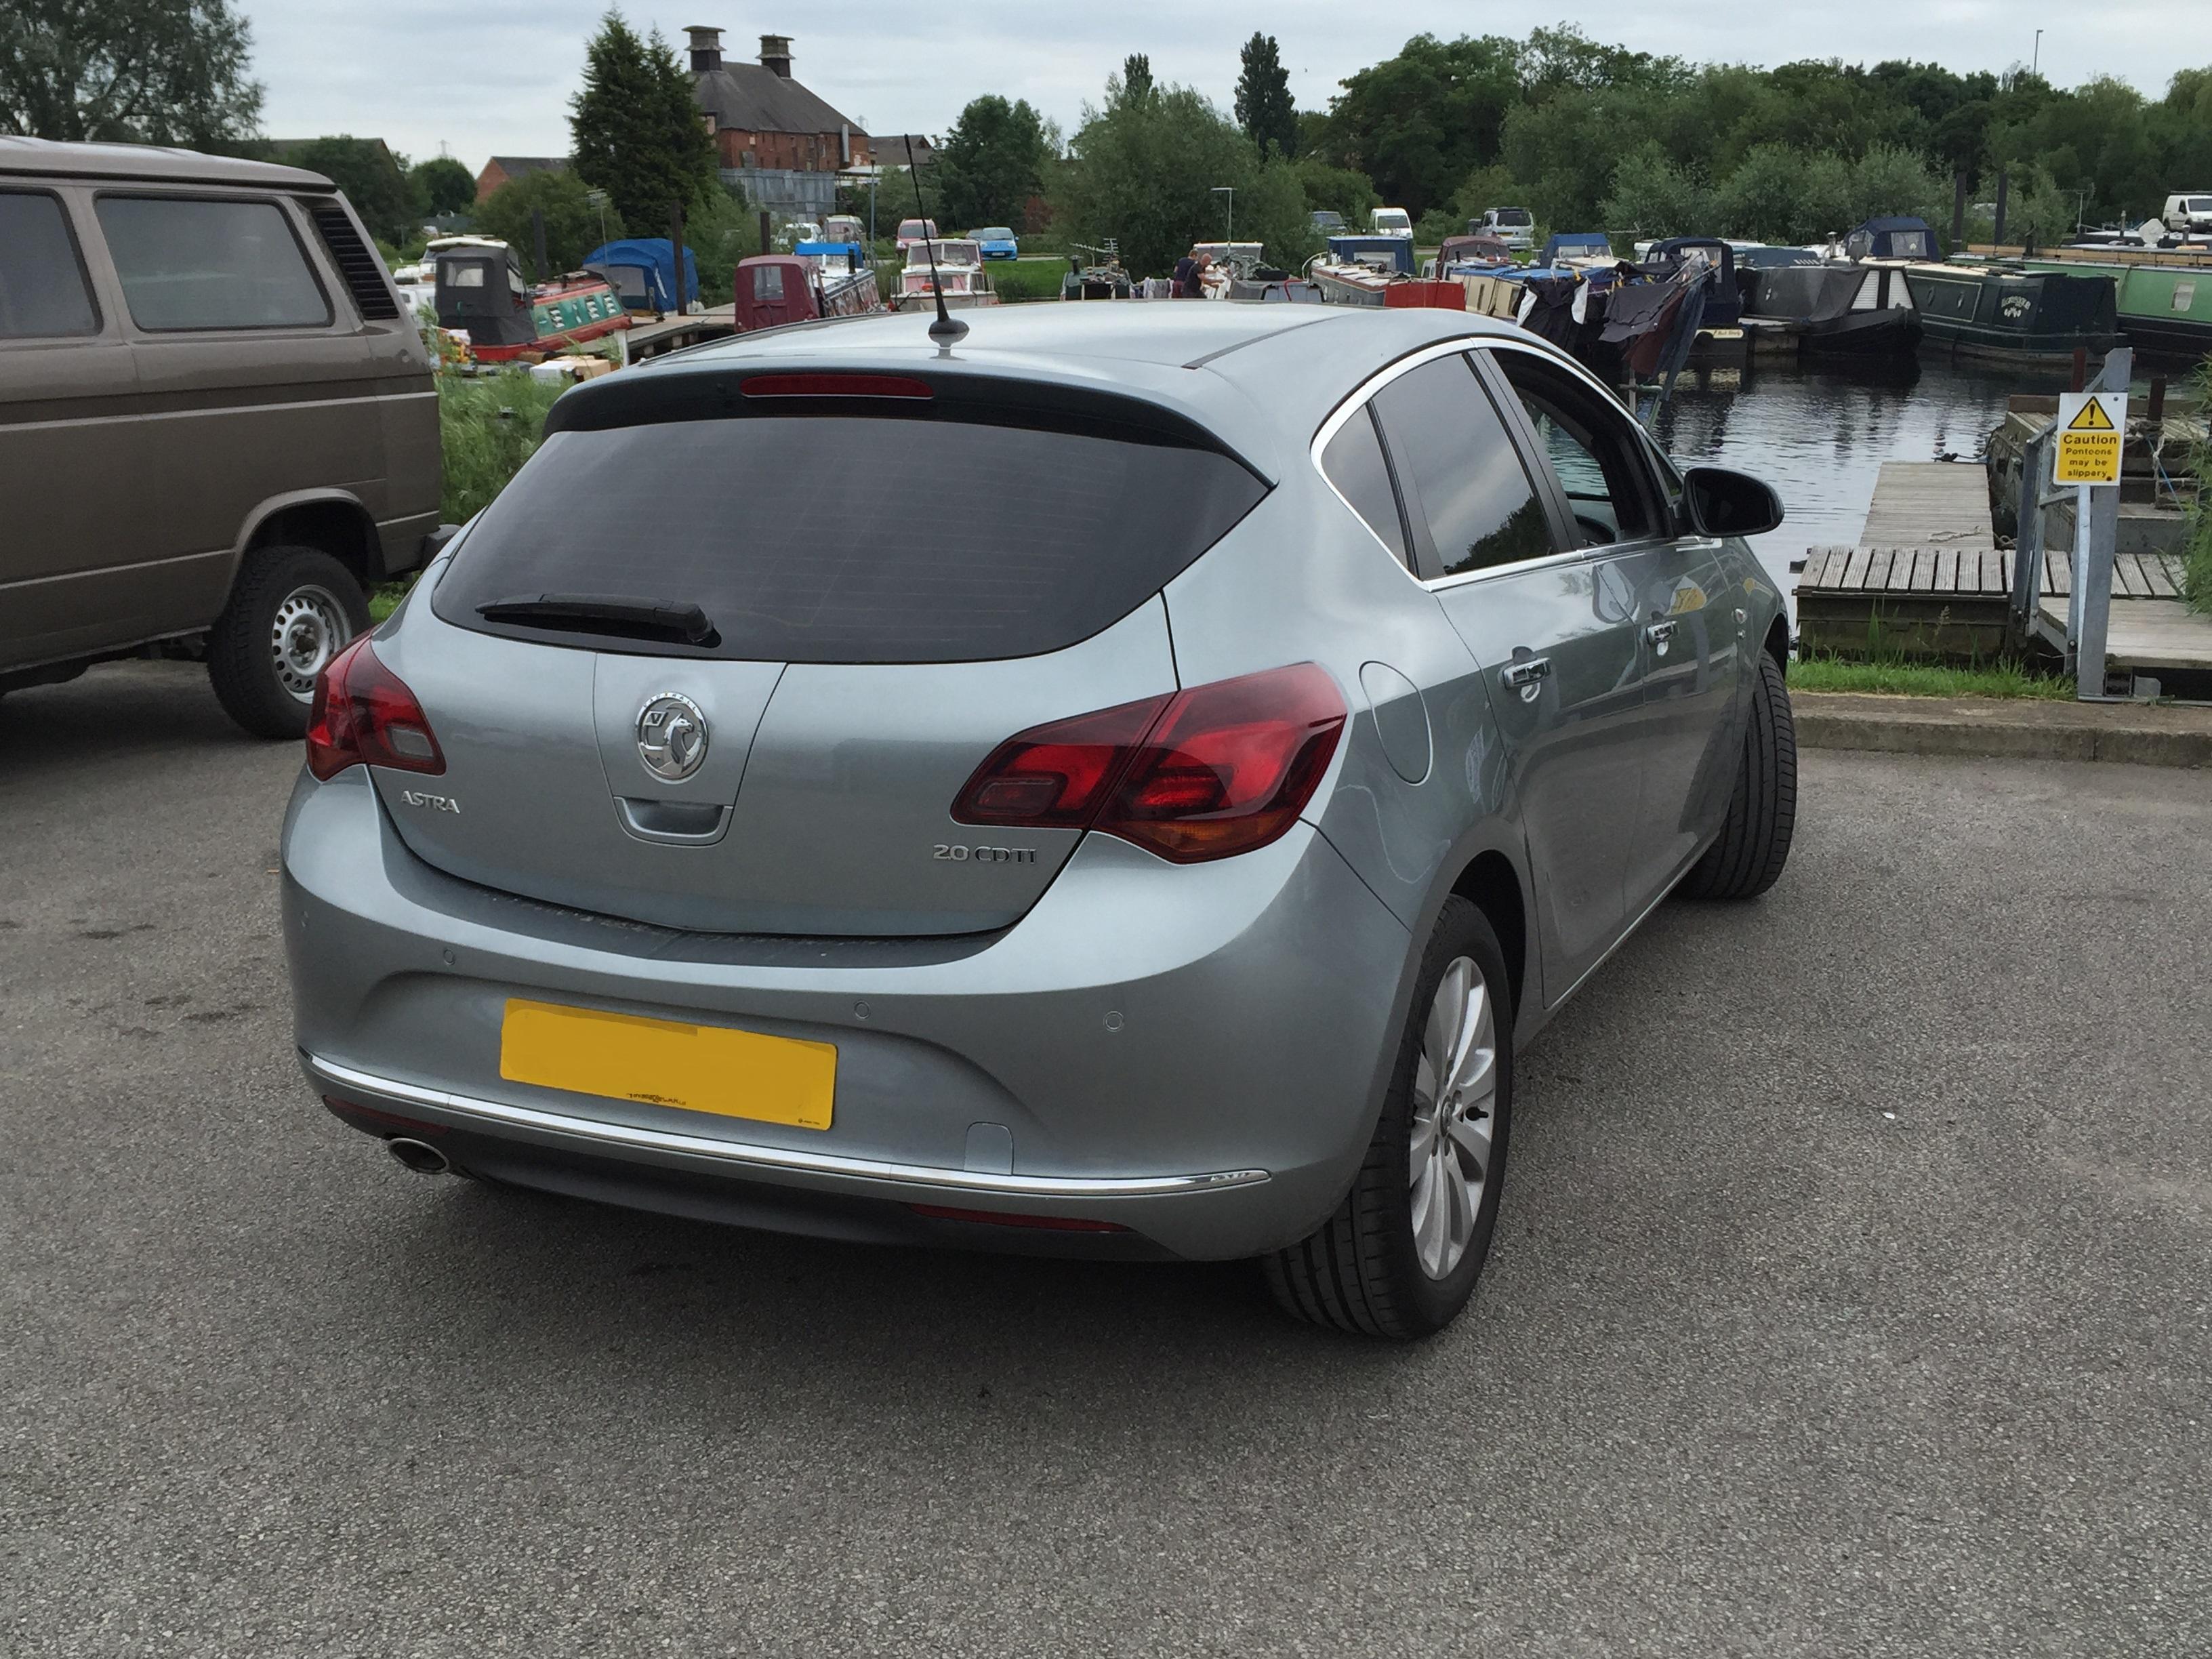 Vauxhall Astra J